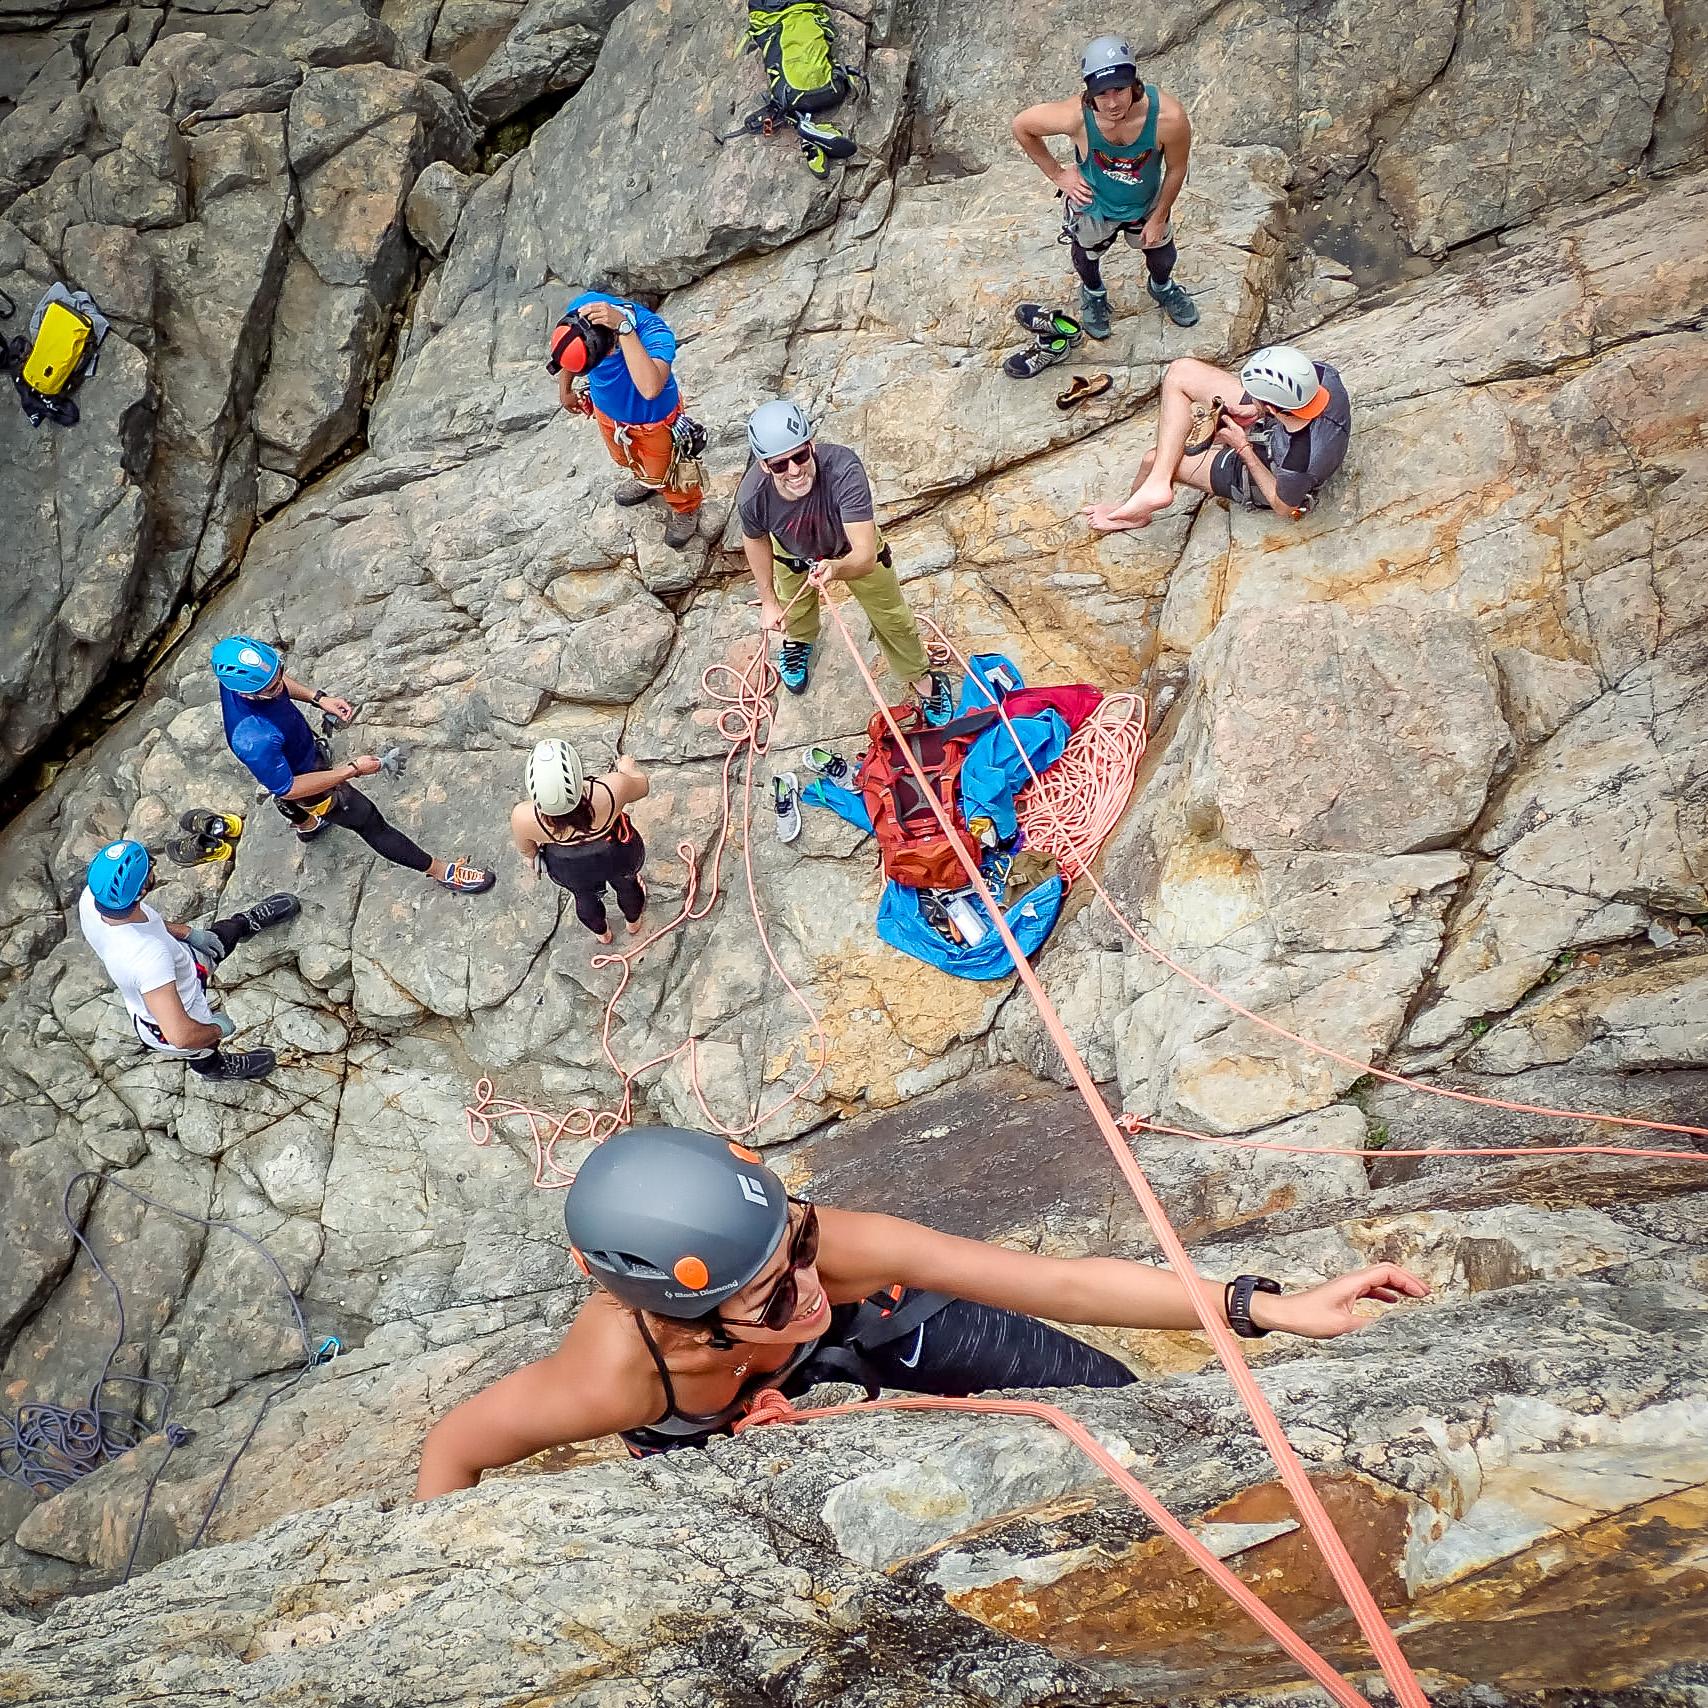 Rock Climbing @ Tung Lung